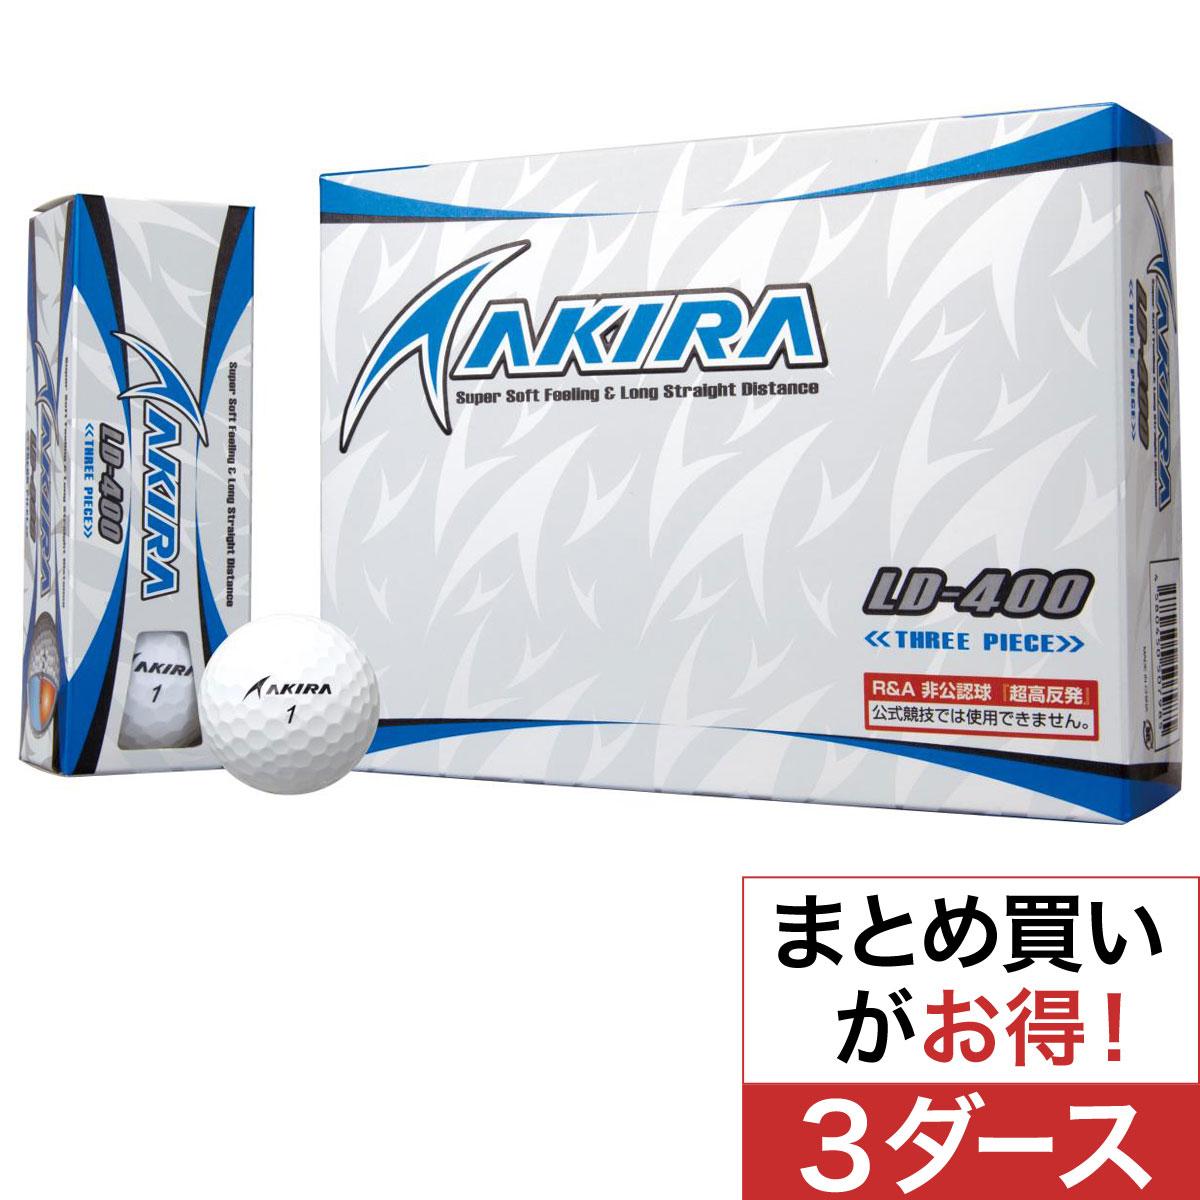 AKIRA LD-400 ボール 超高反発モデル 3ダースセット【非公認球】